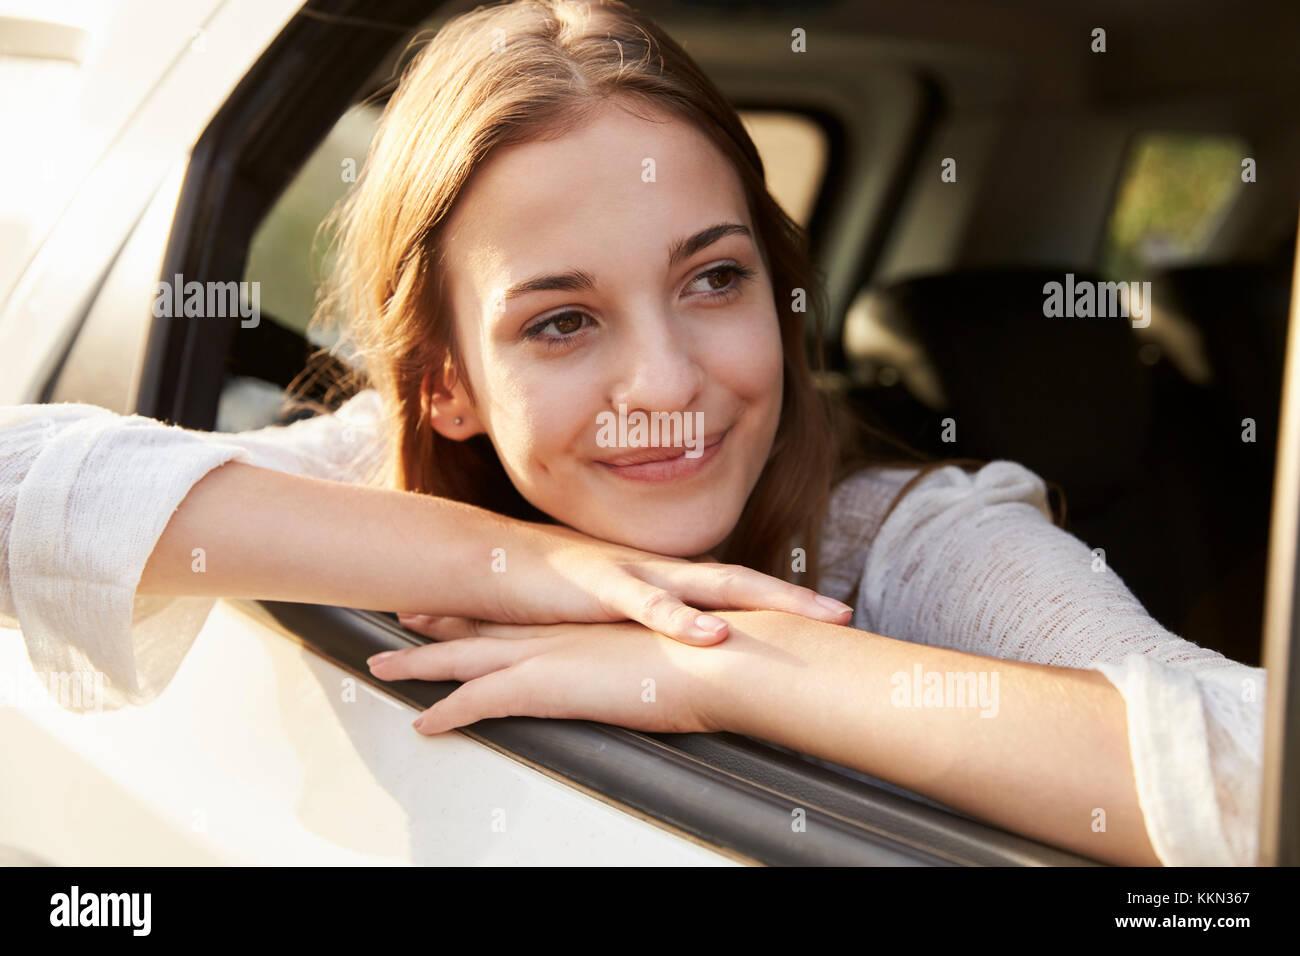 teenage girl looking out window stock photos amp teenage